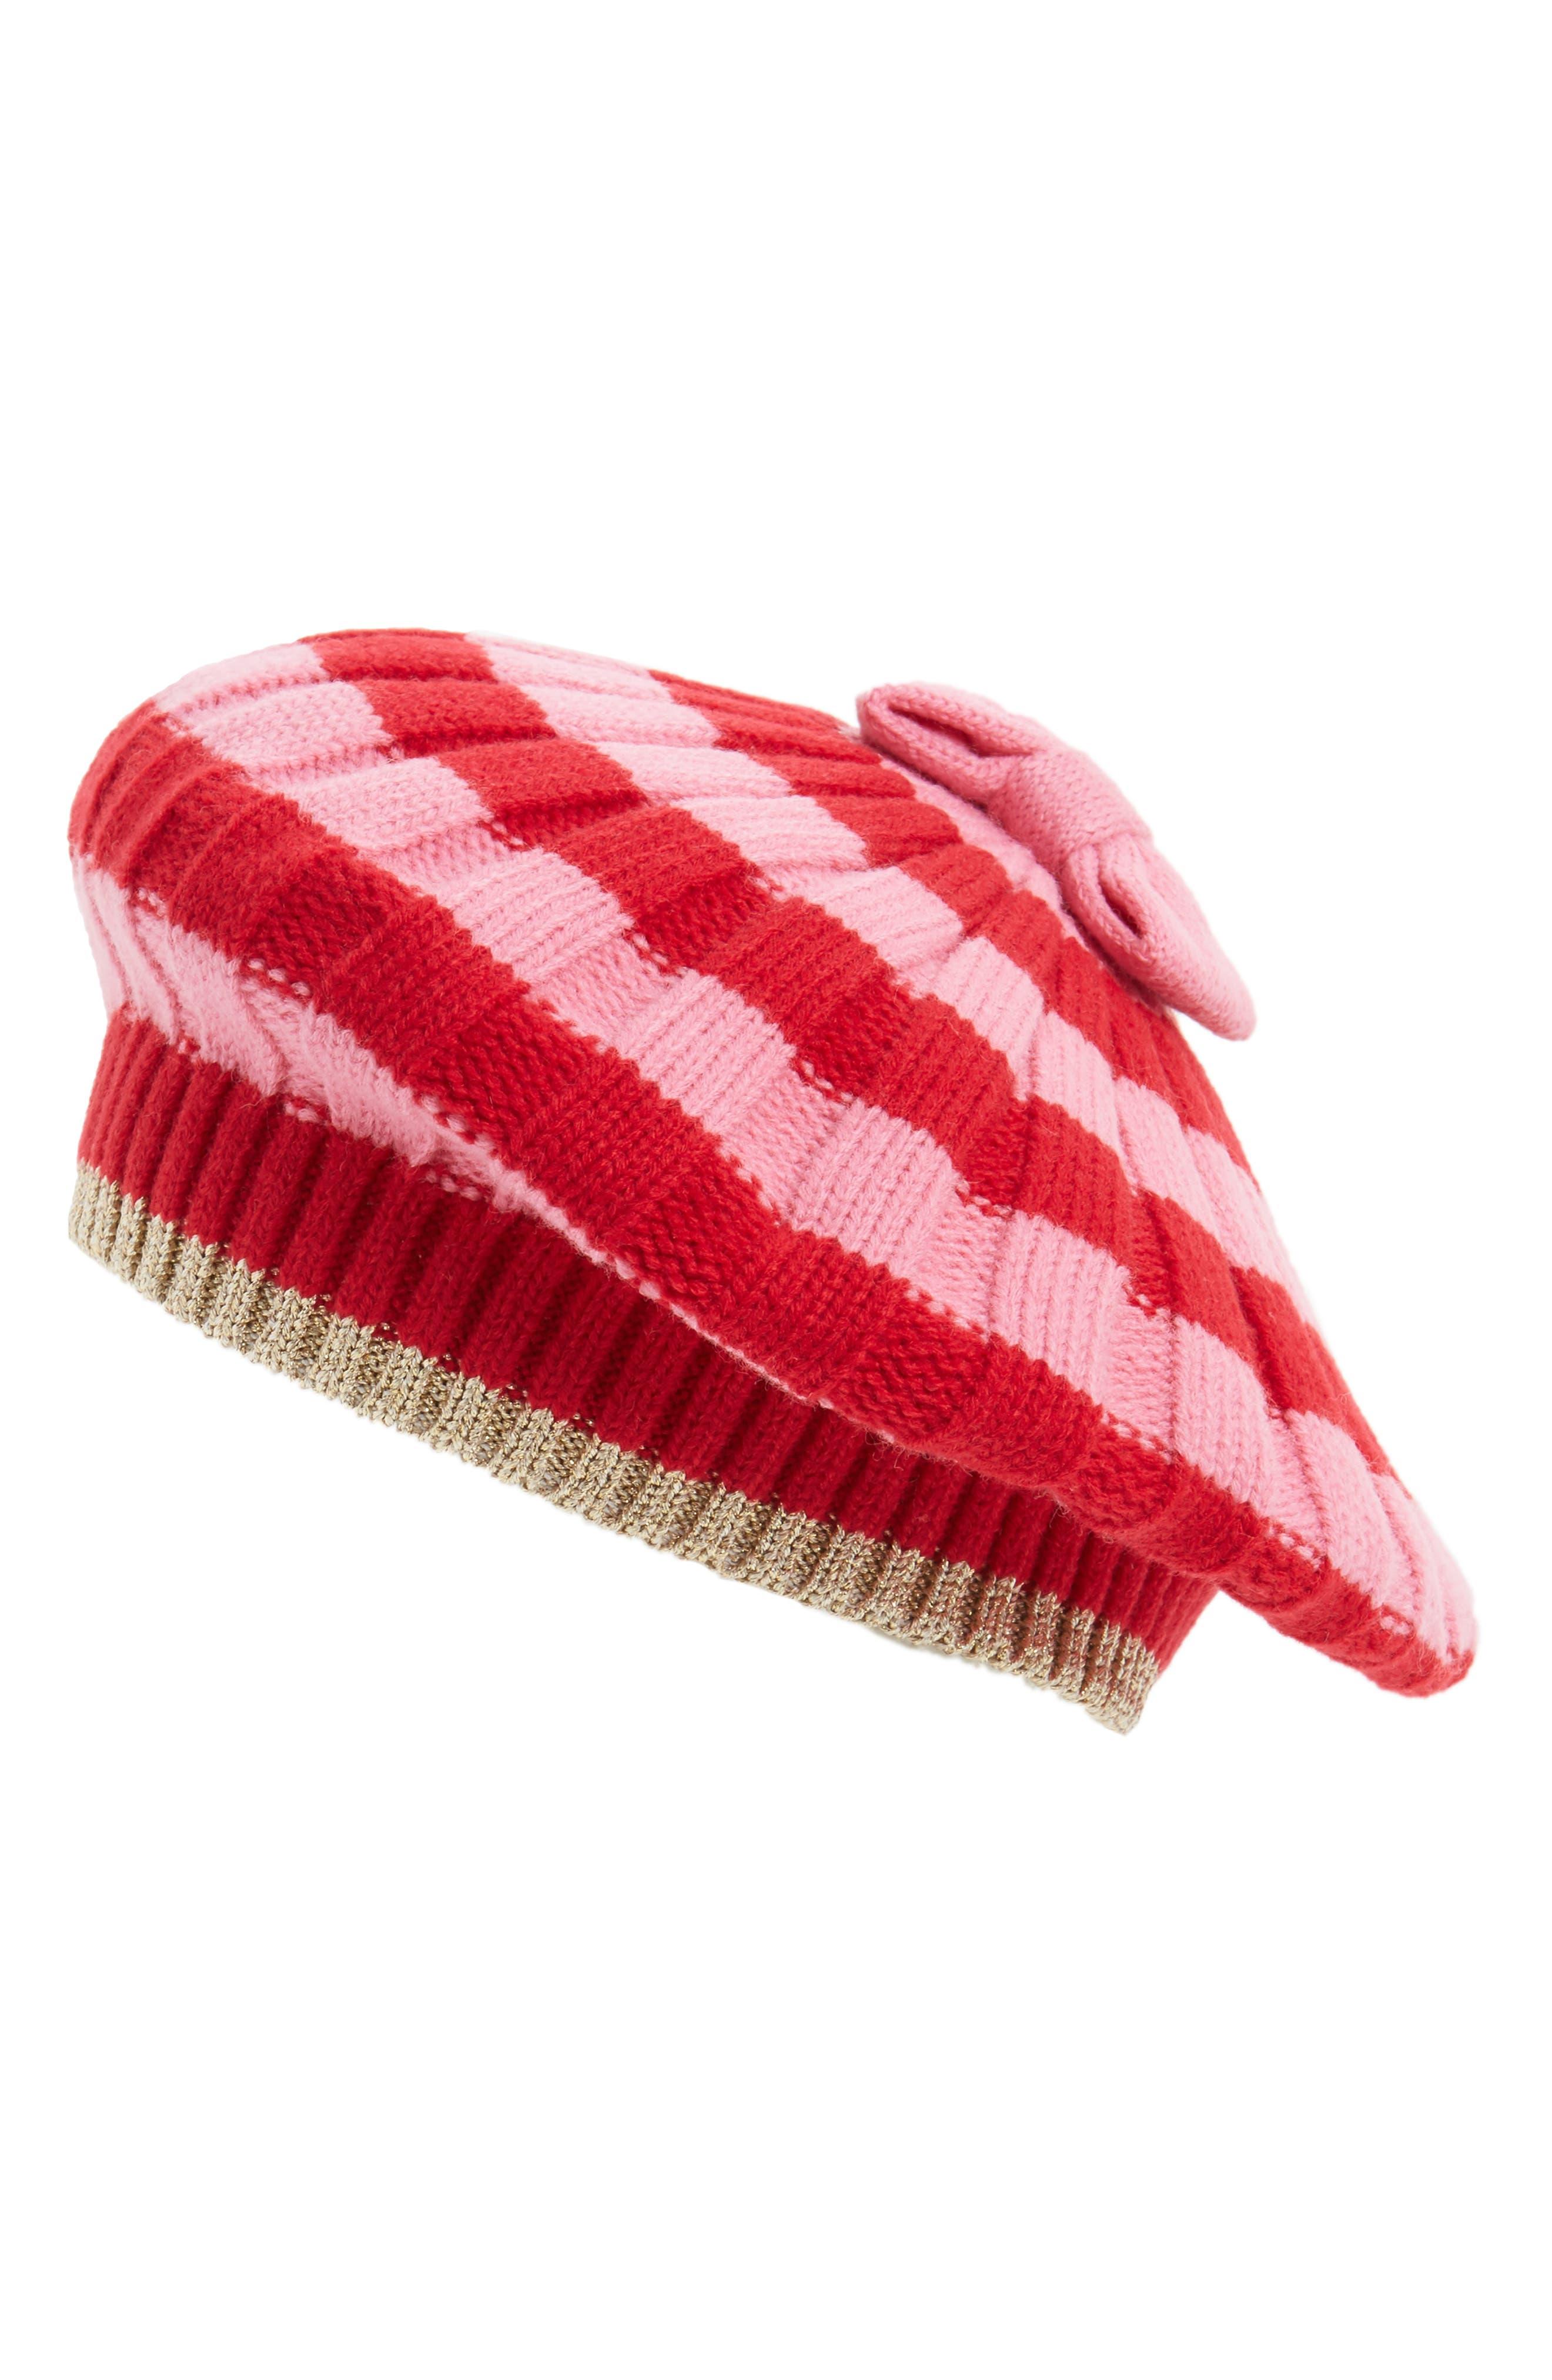 Kate Spade New York Hats for Women | Nordstrom